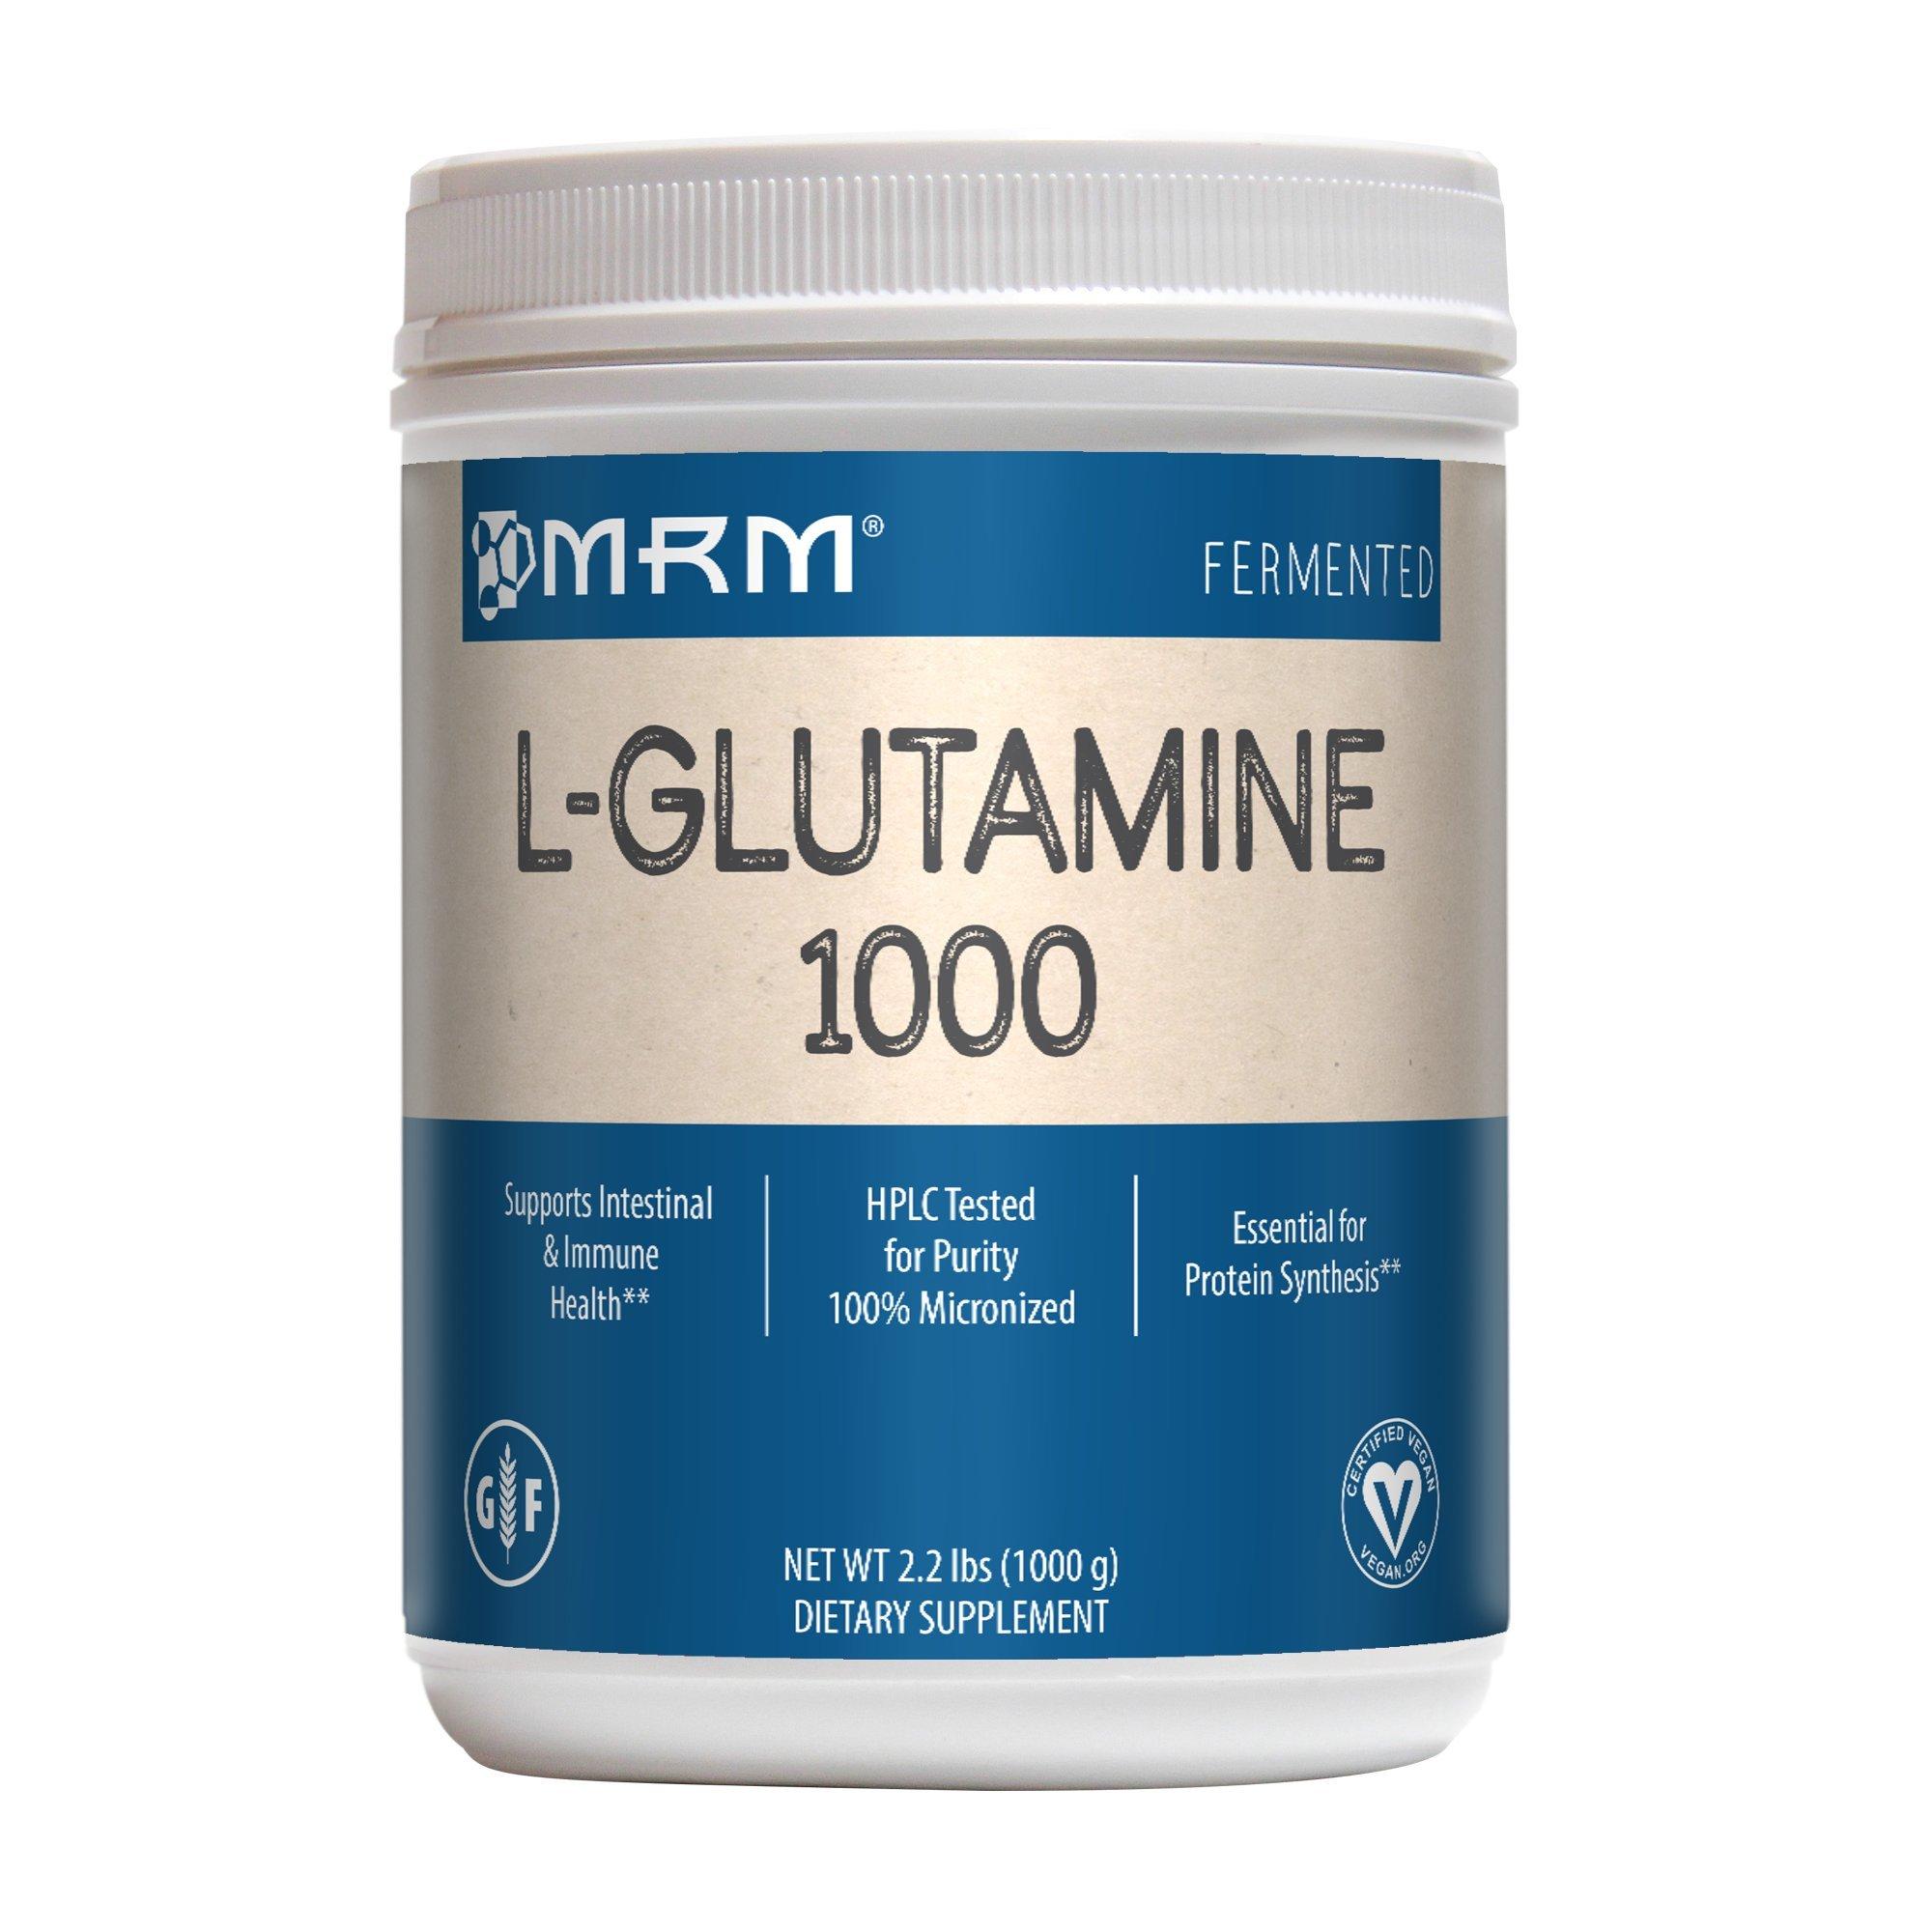 MRM L-Glutamine 1000mg Powder, 2.2 lbs by MRM